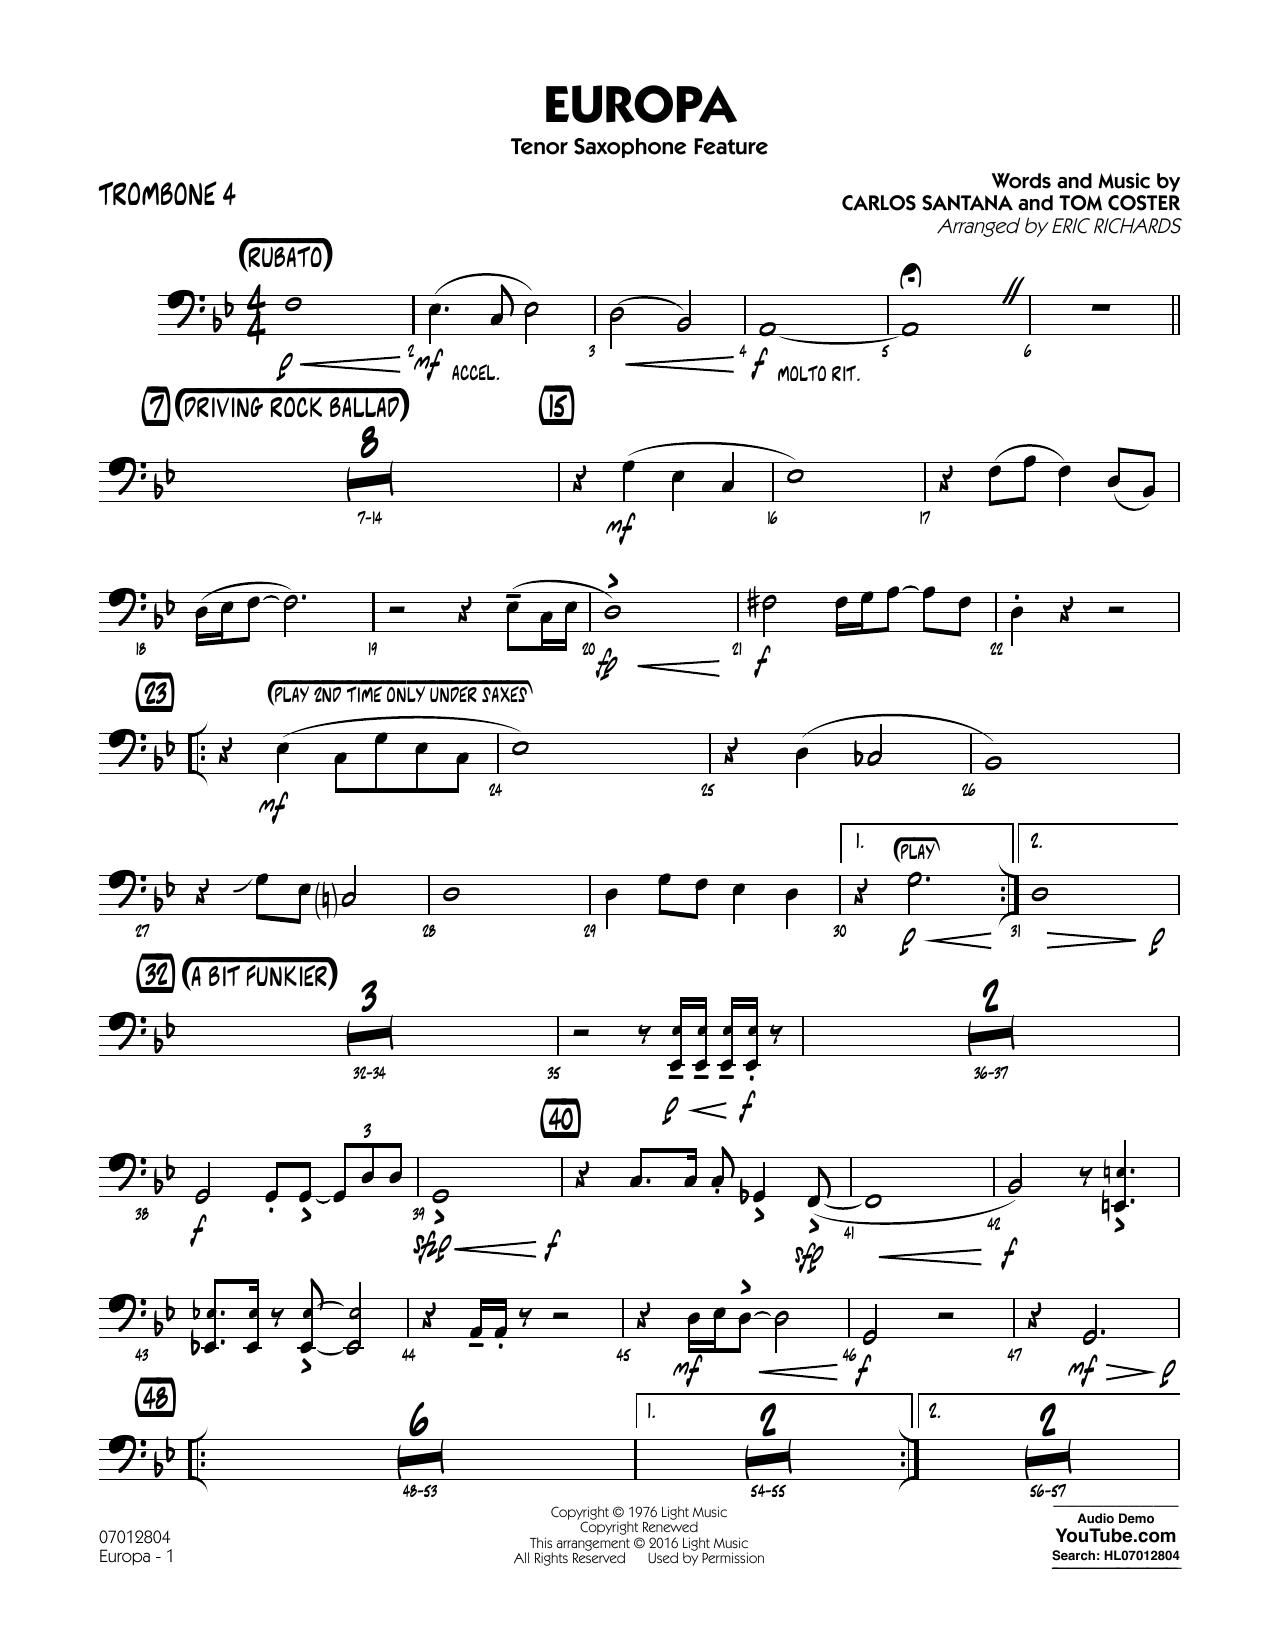 Europa - Trombone 4 (Jazz Ensemble)